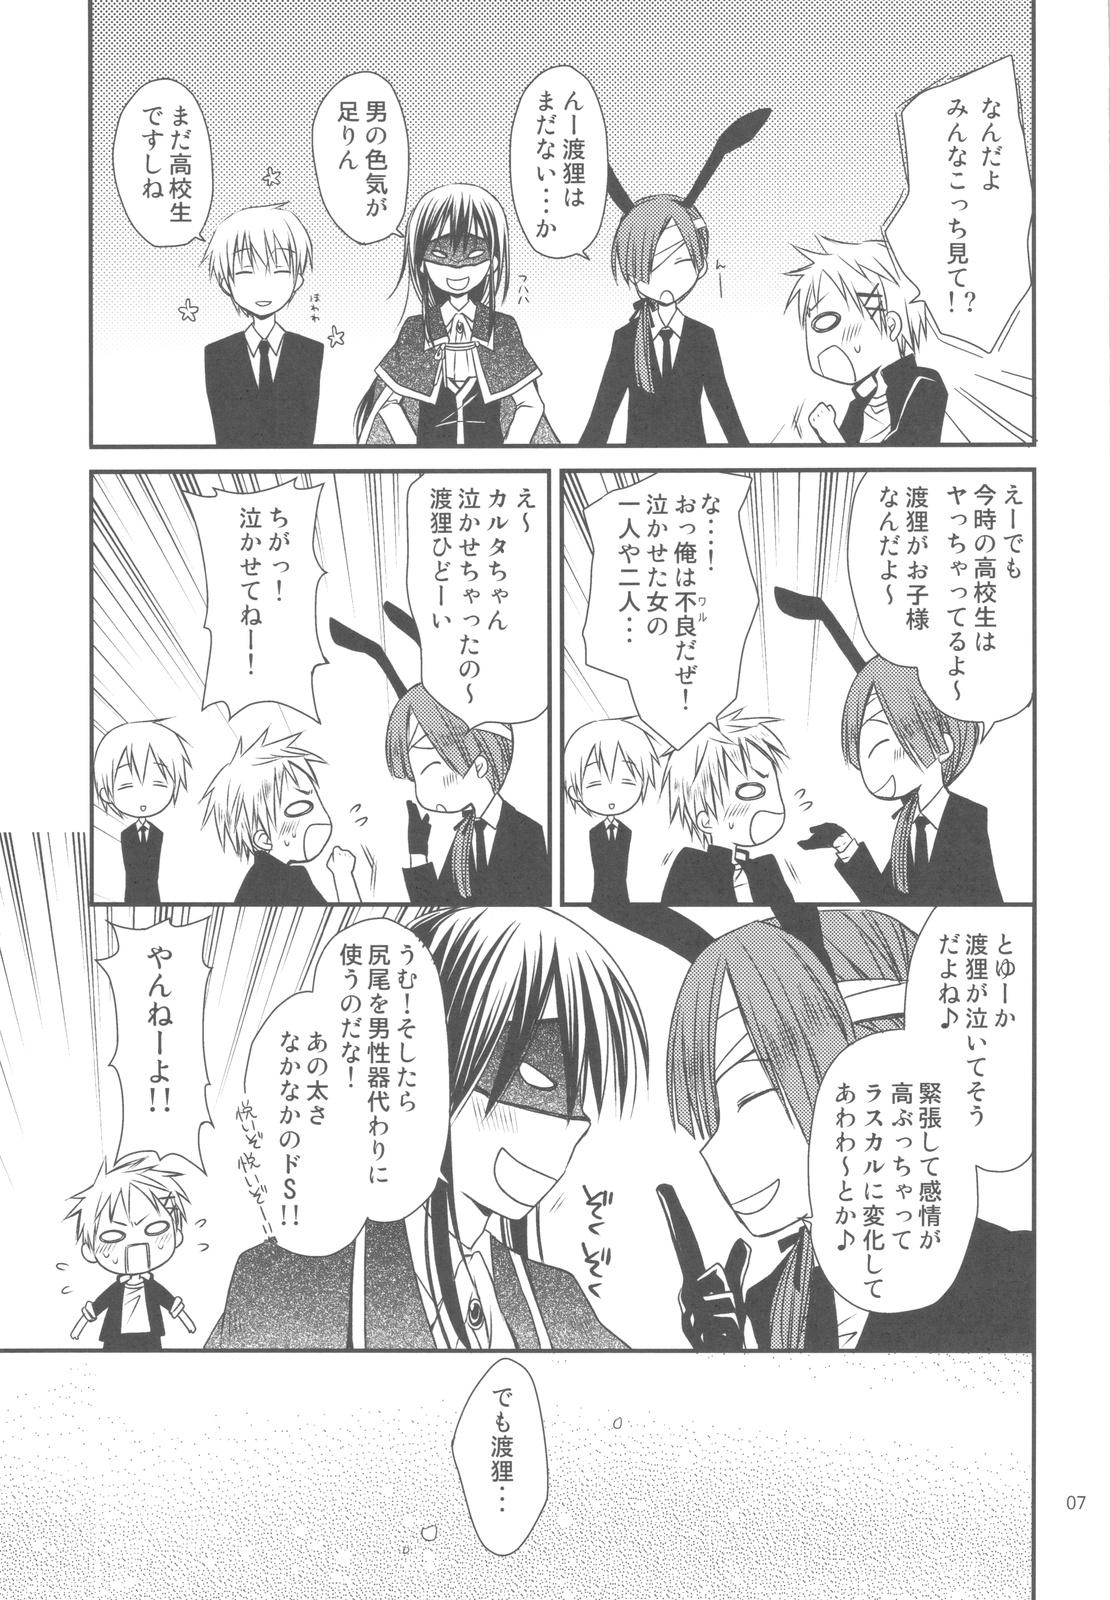 Chiisana Ai no Monogatari 5